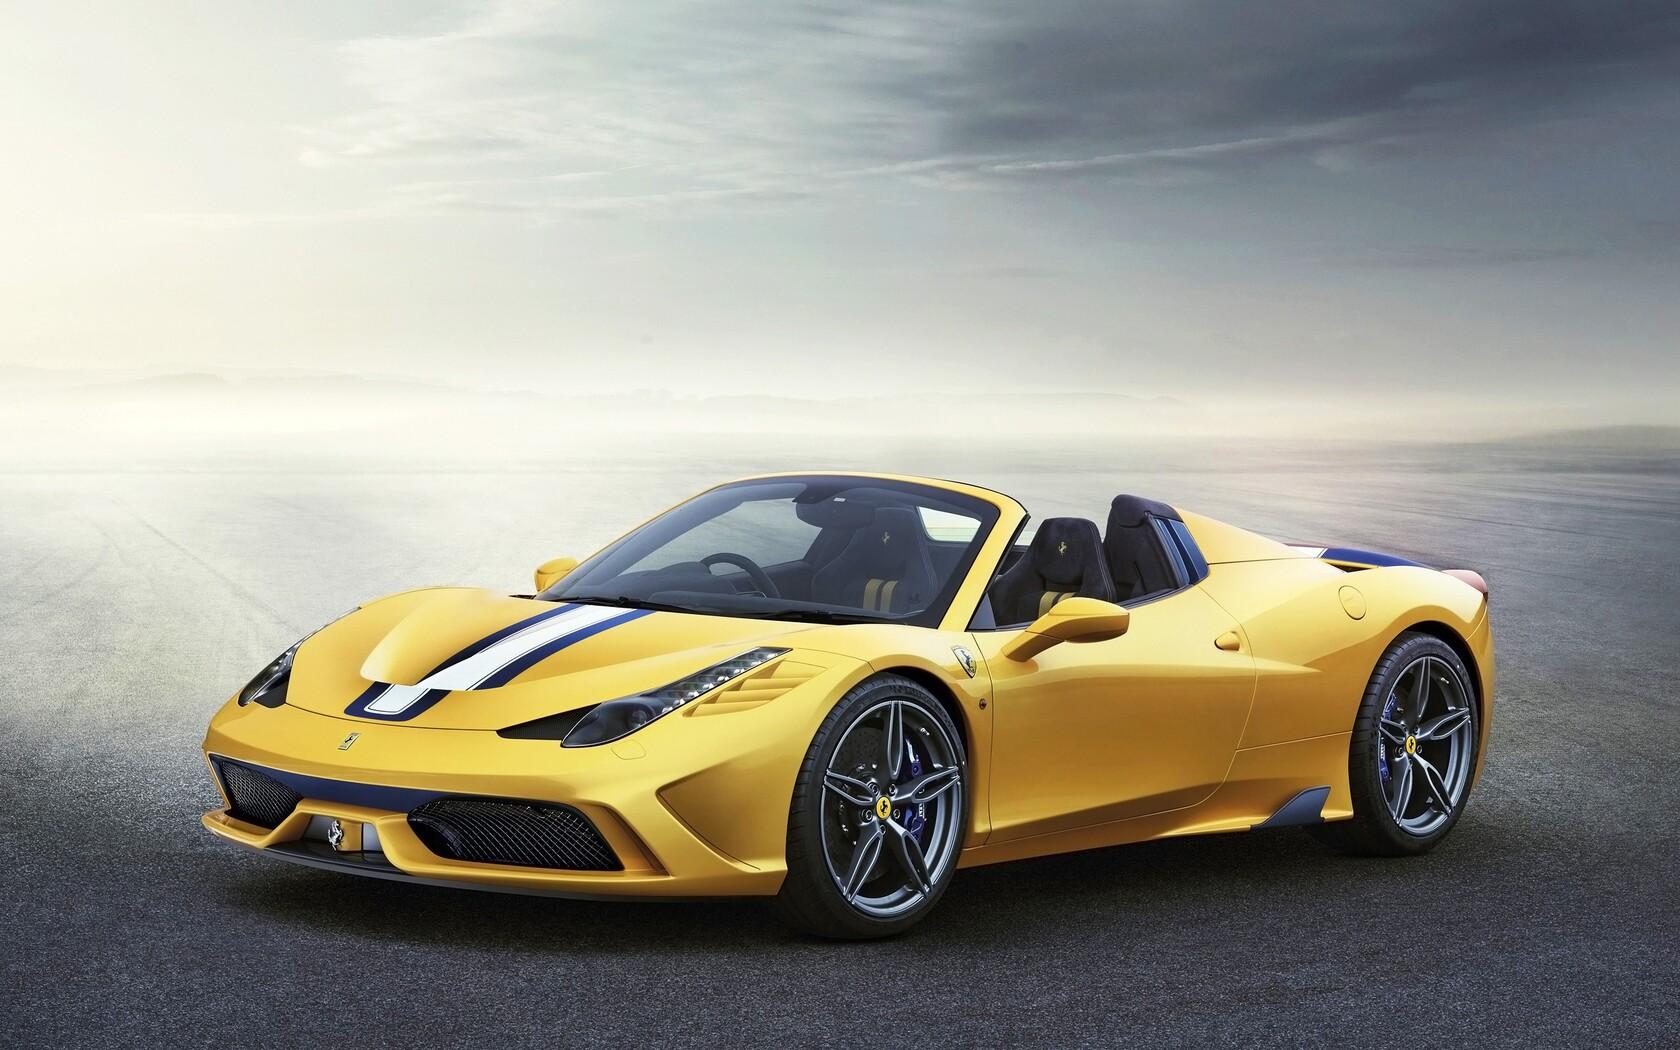 1680x1050 Ferrari 458 Speciale A 1680x1050 Resolution Hd 4k